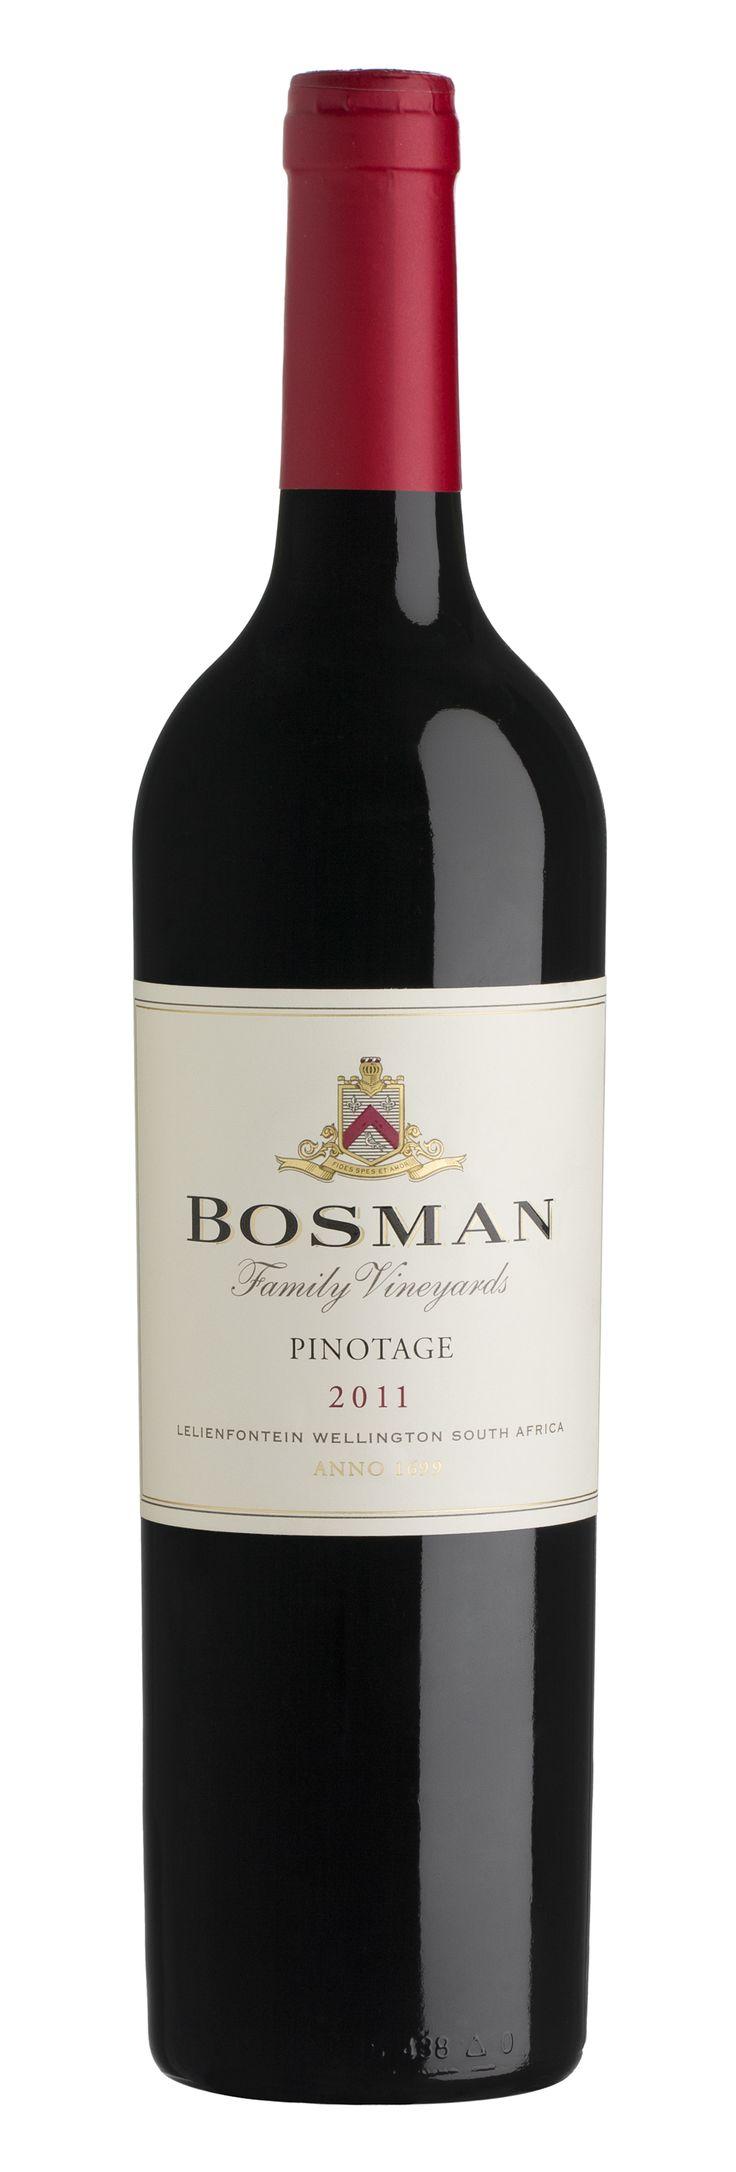 Bosman Pinotage 2011